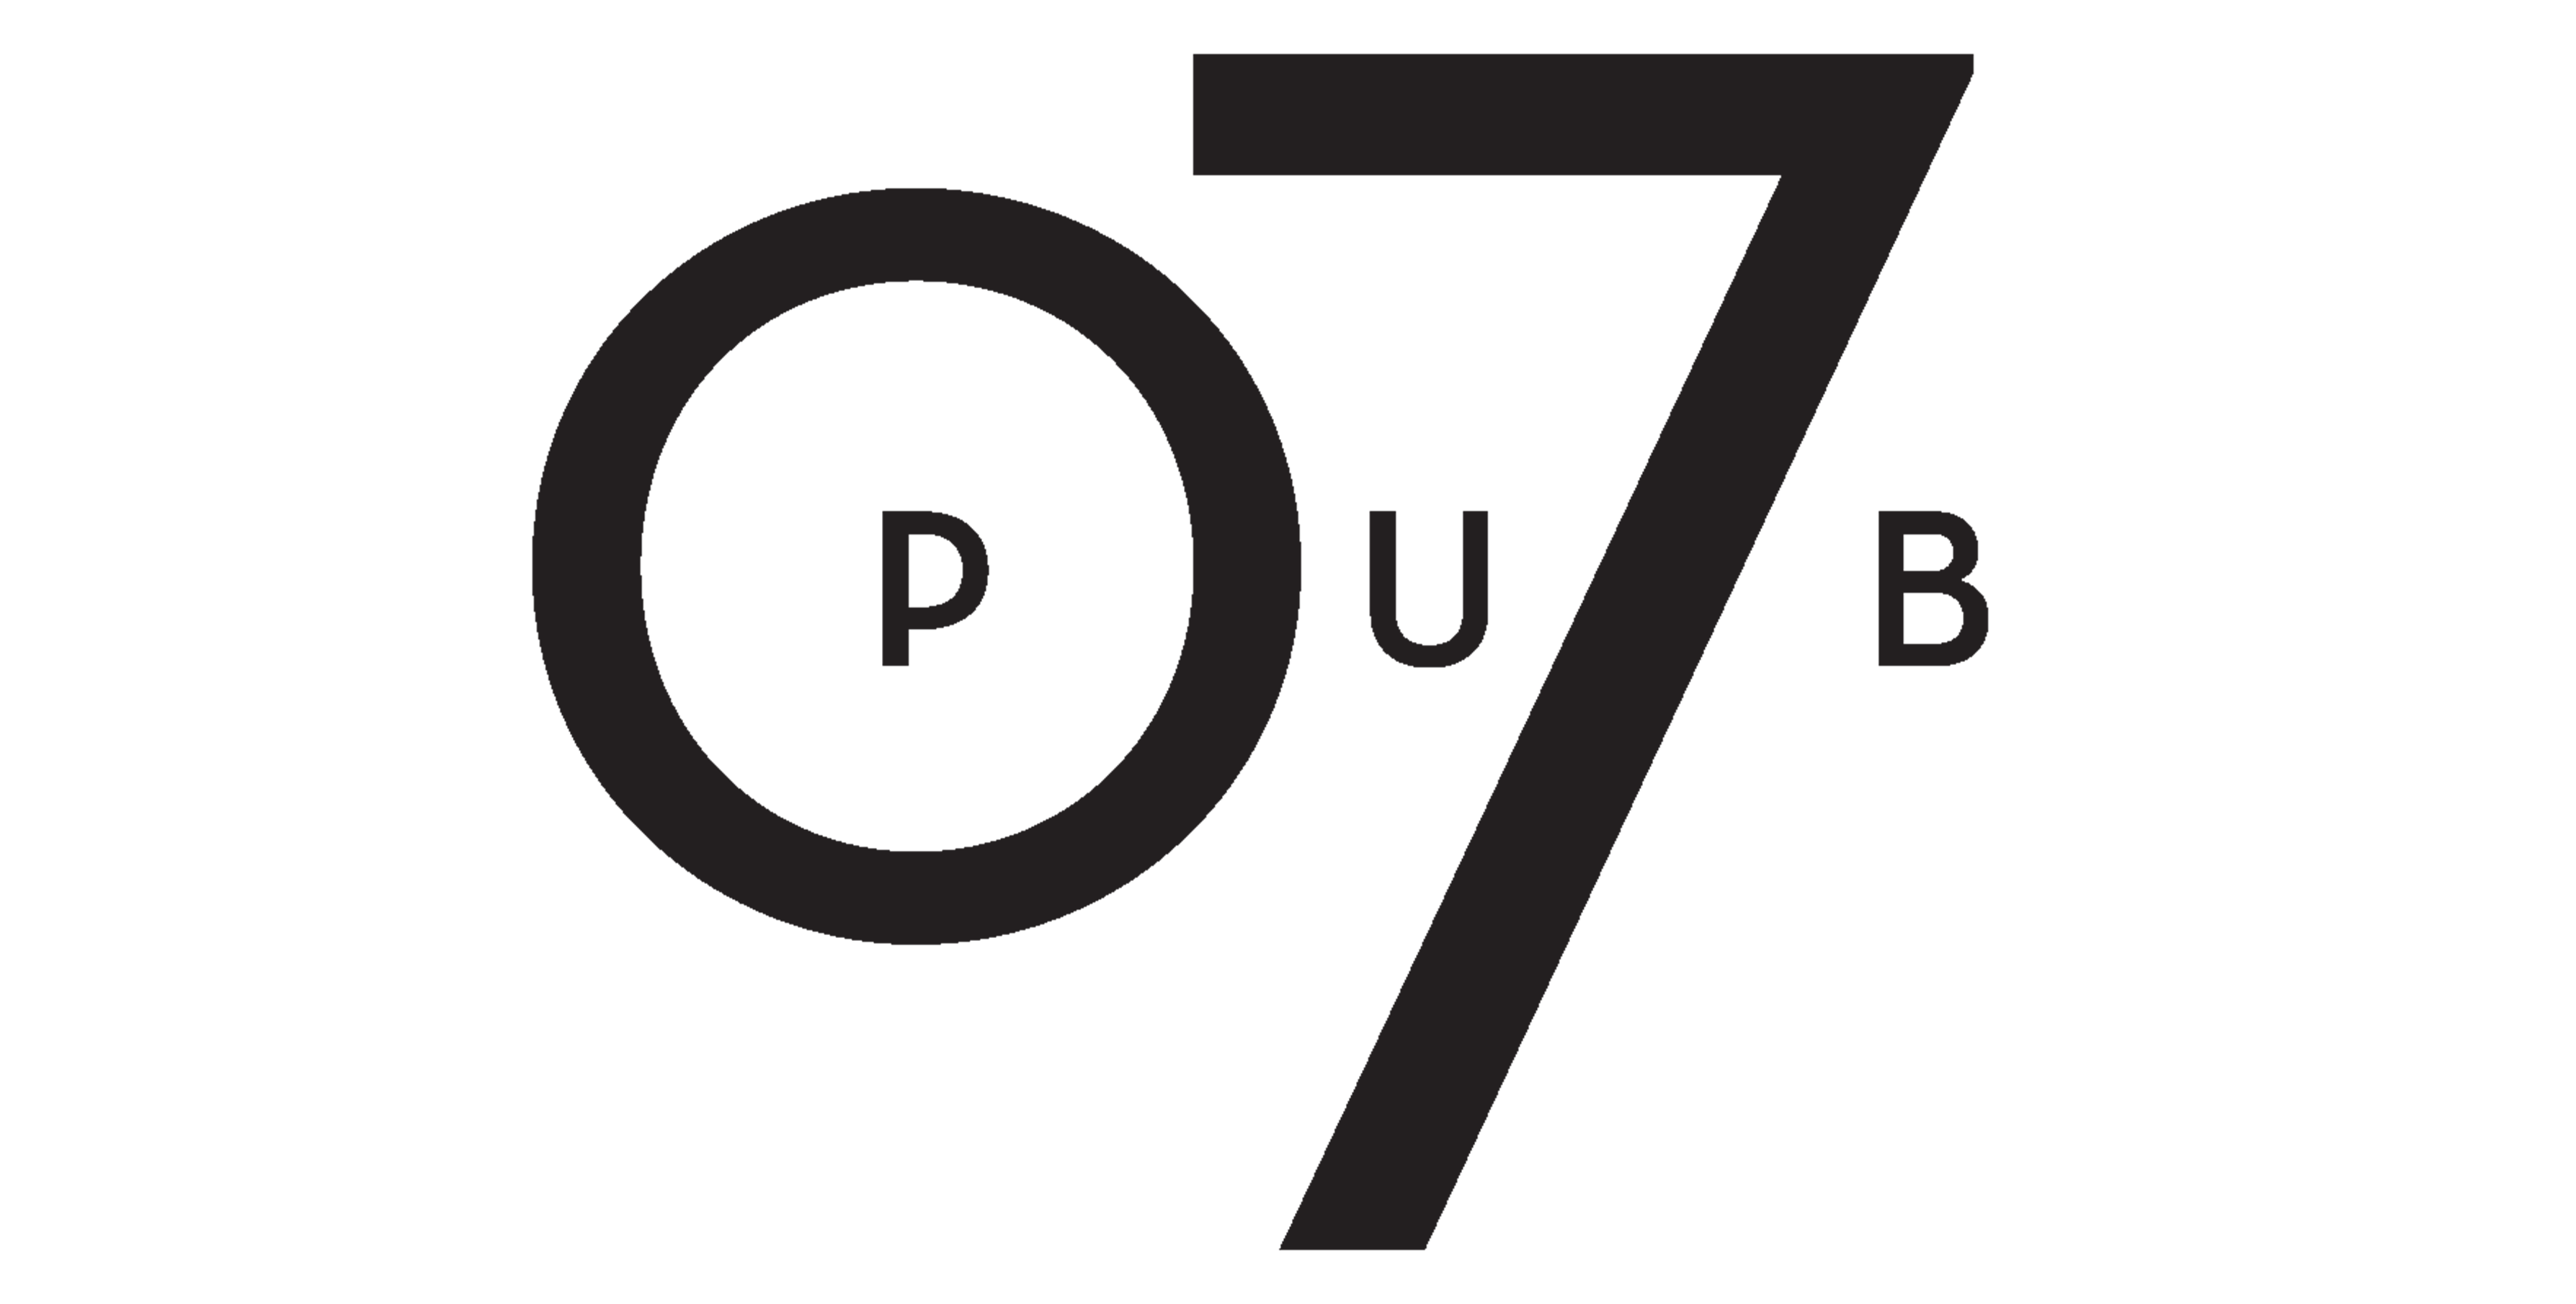 07 Pub Tech company logos, Company logo, Letters